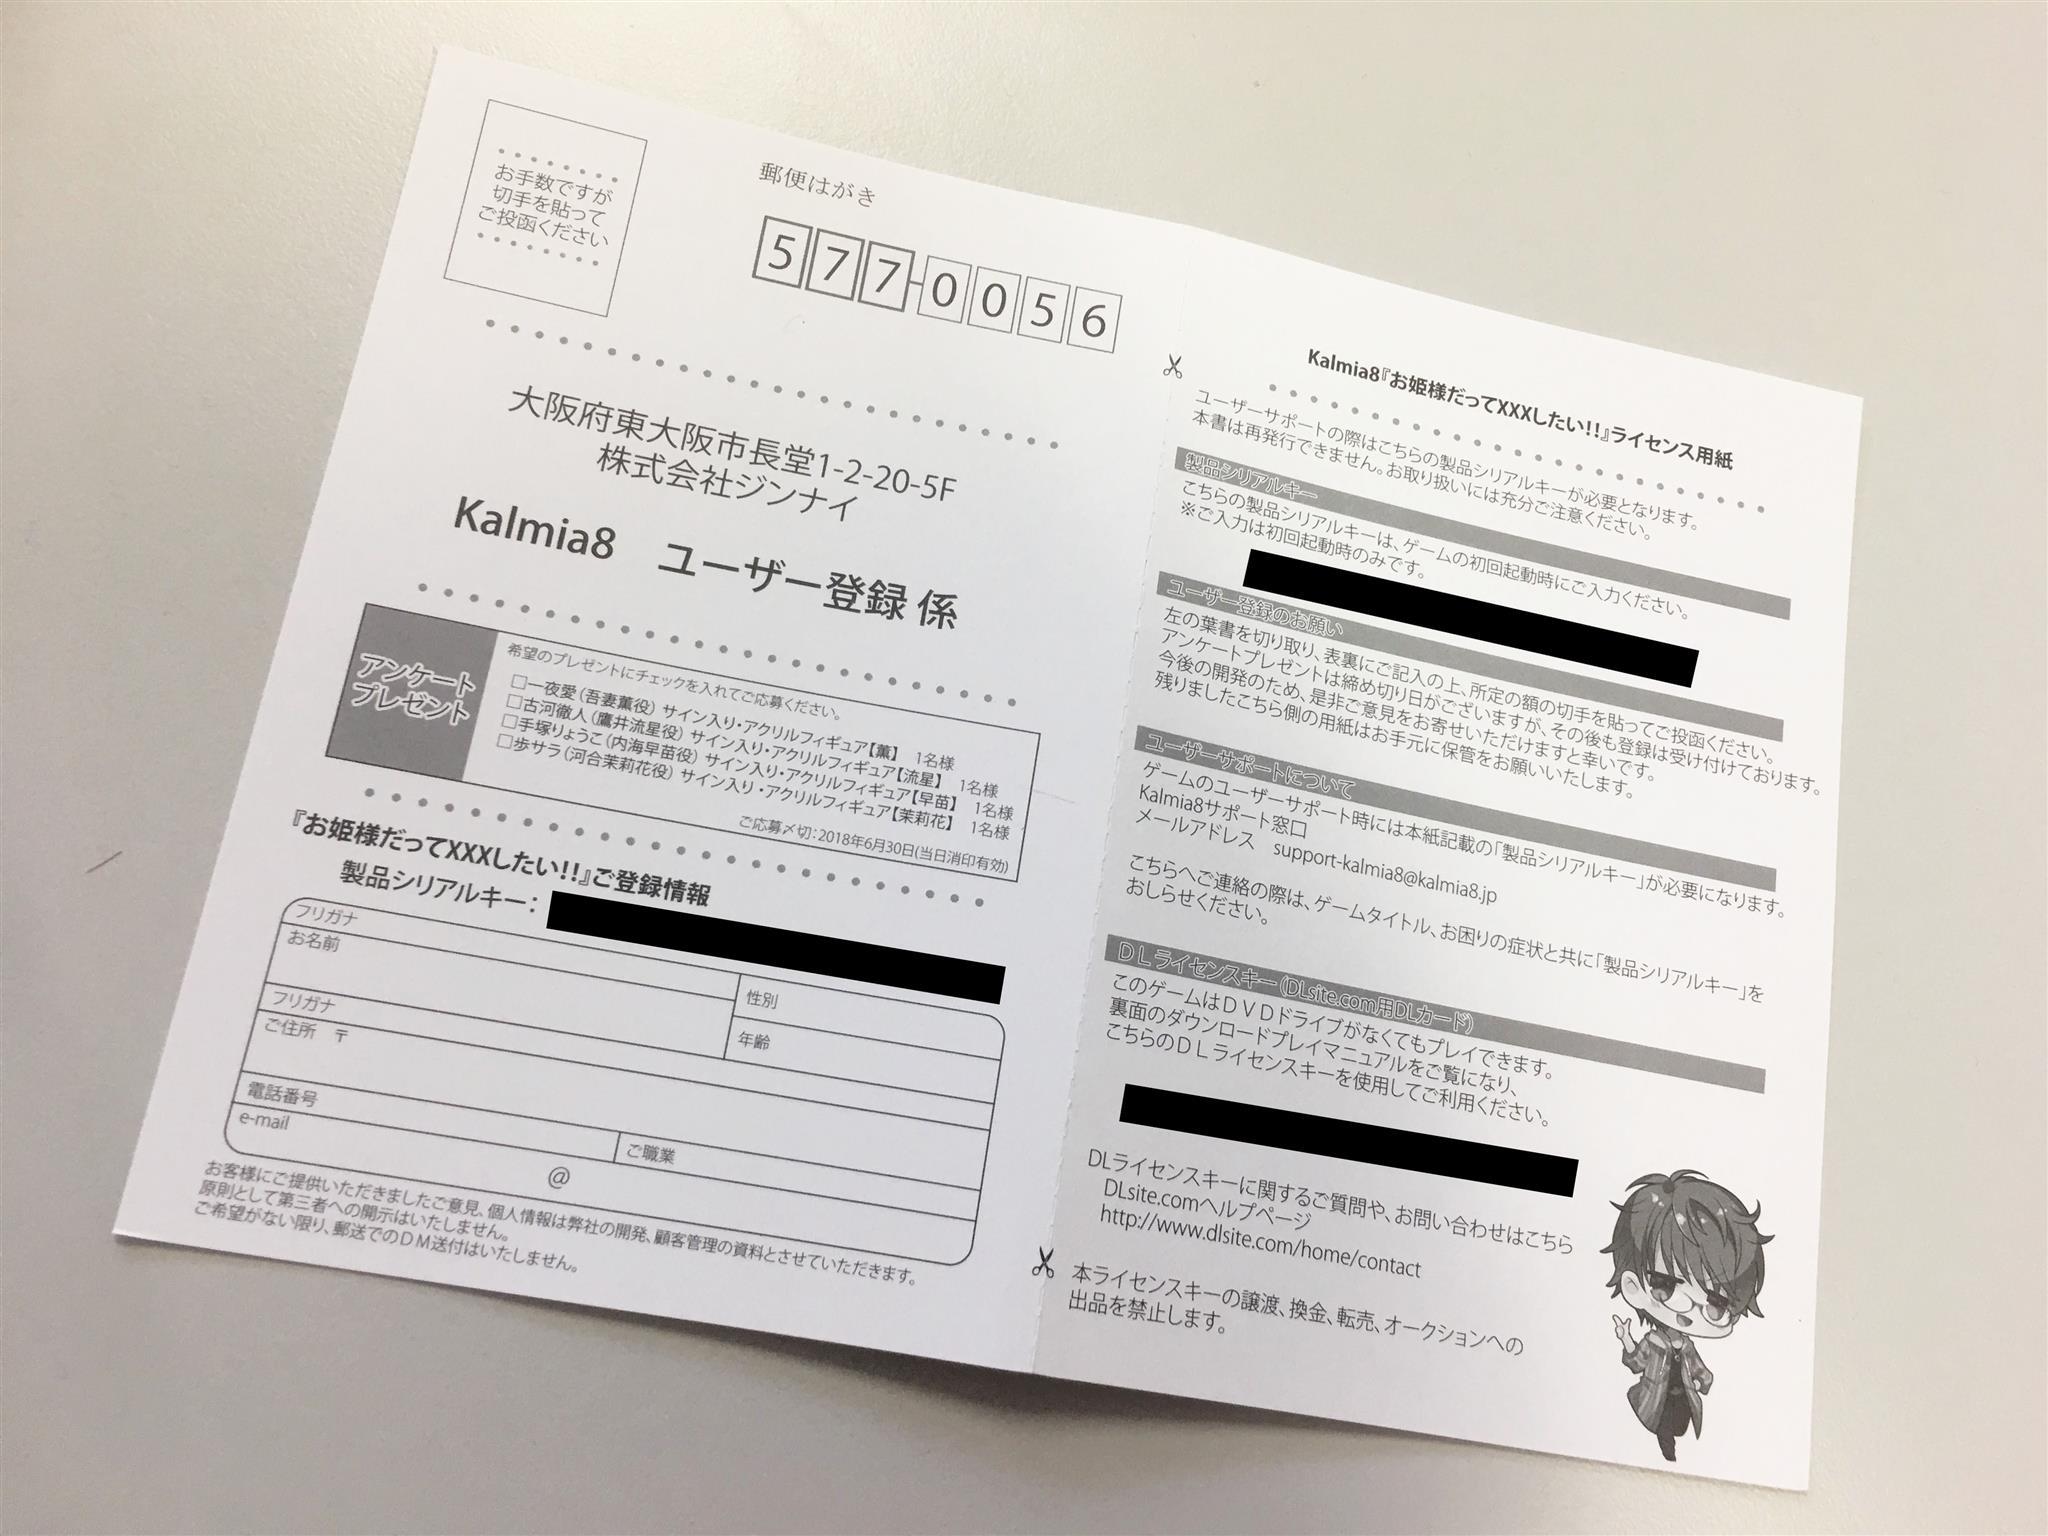 http://kalmia8.jp/blog/2018/03/30/%E3%83%8F%E3%82%AC%E3%82%AD%E5%86%99%E7%9C%9F.jpg